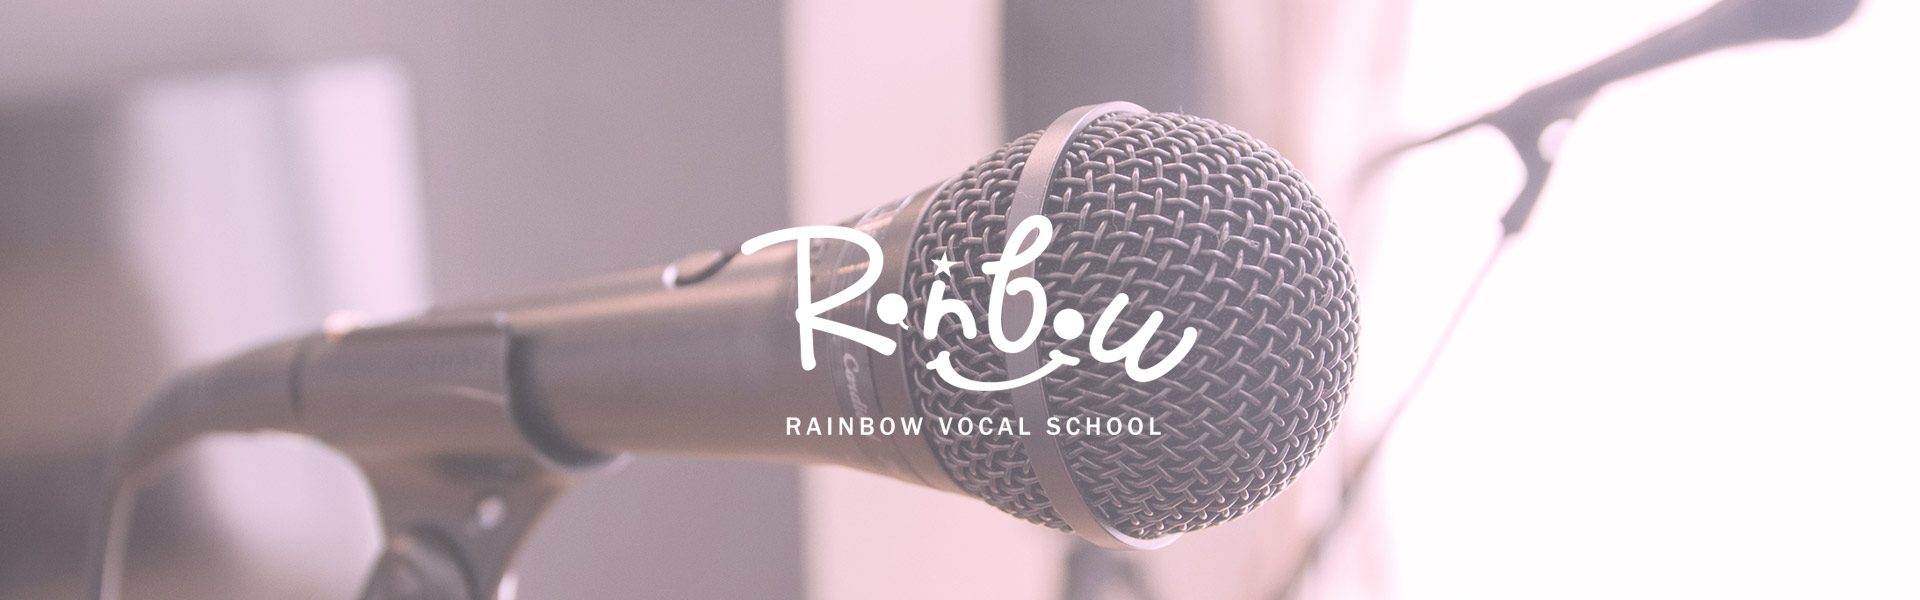 Rainbow Vocal School